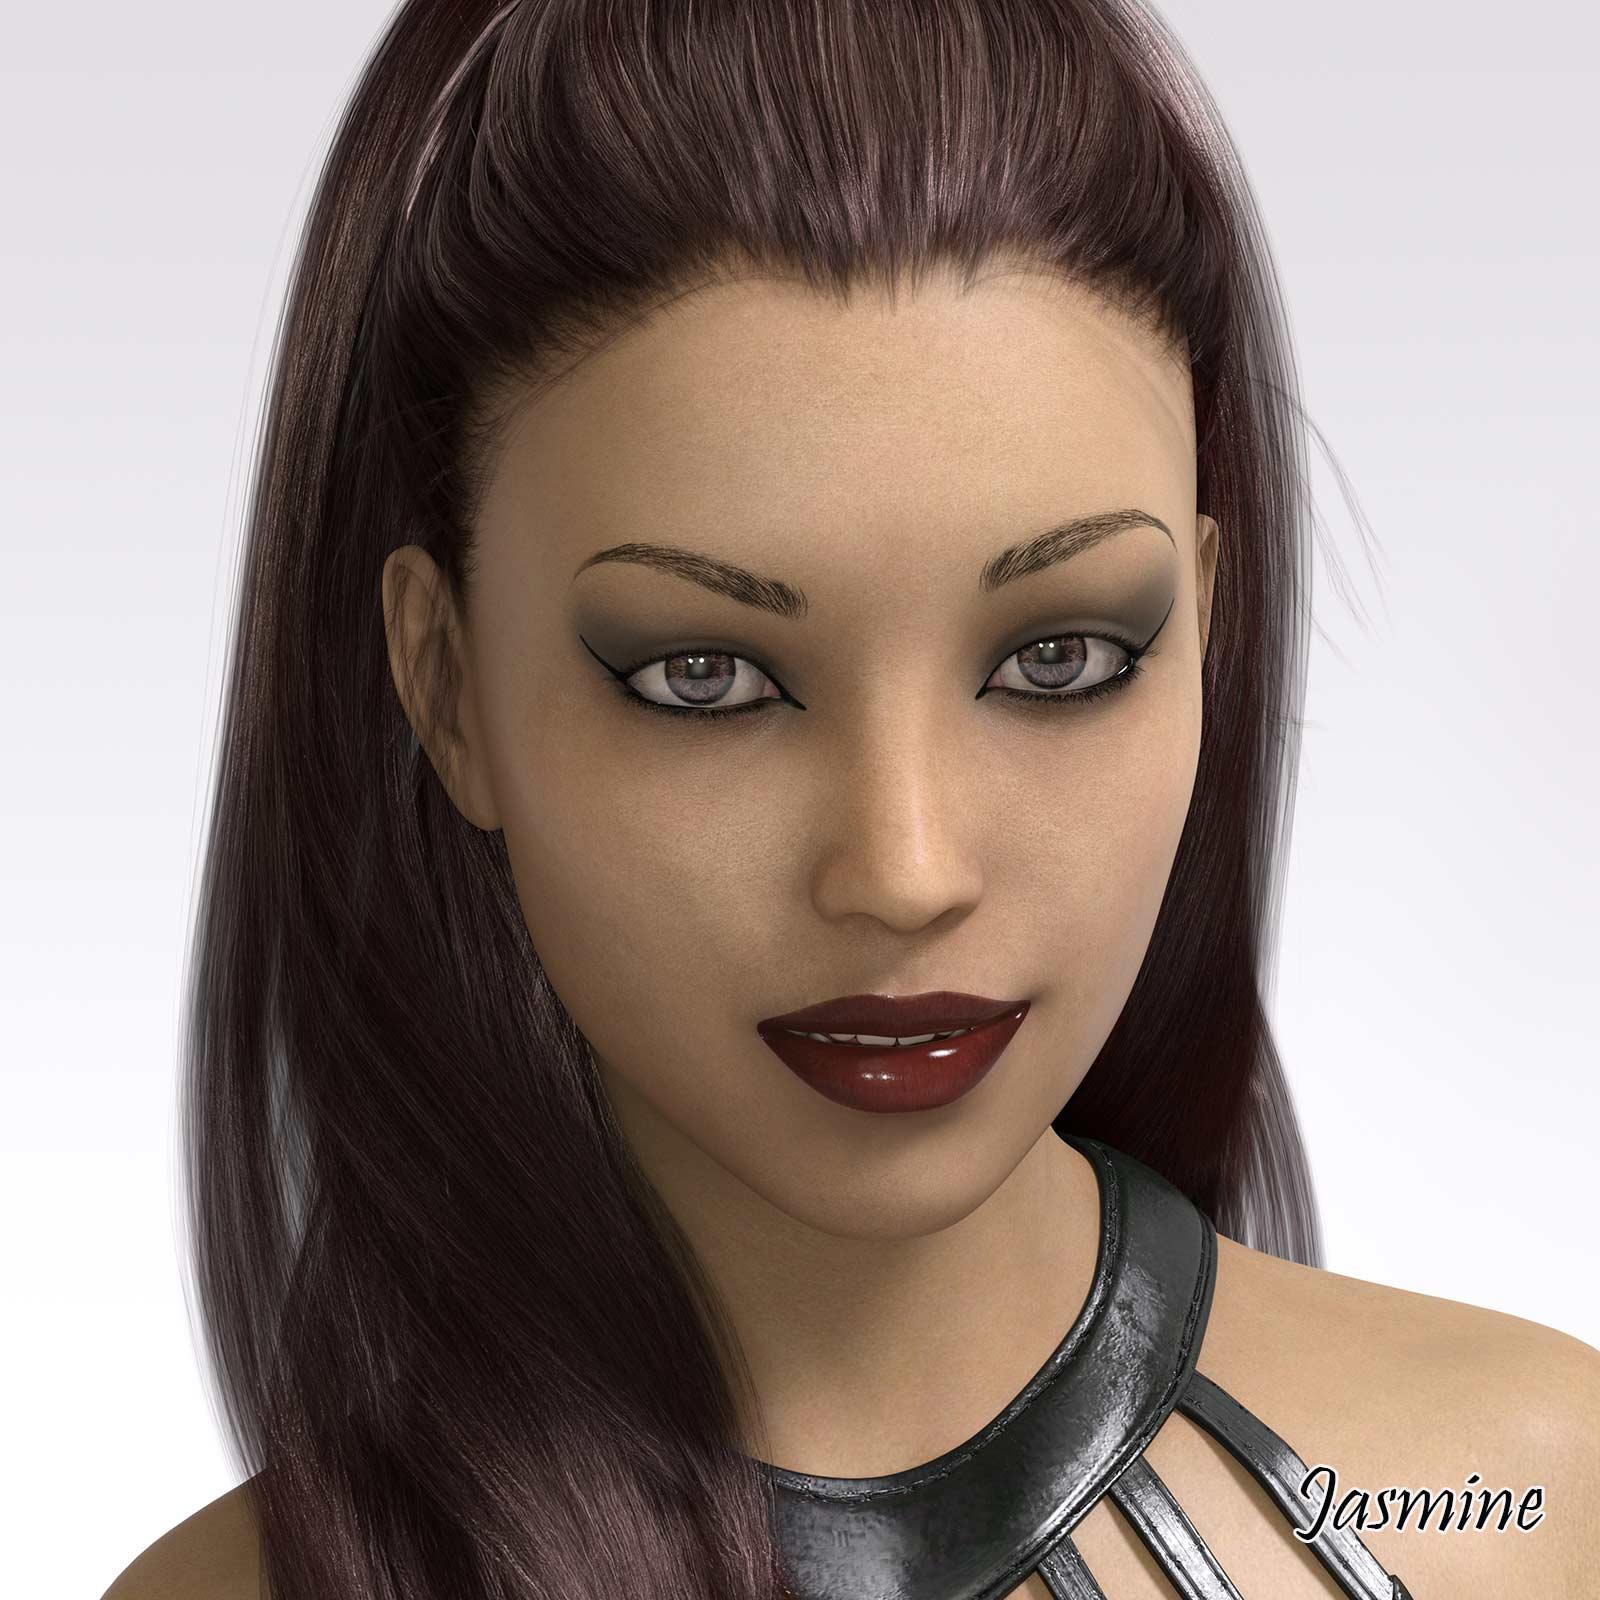 uc_art Jasmine G8F Character